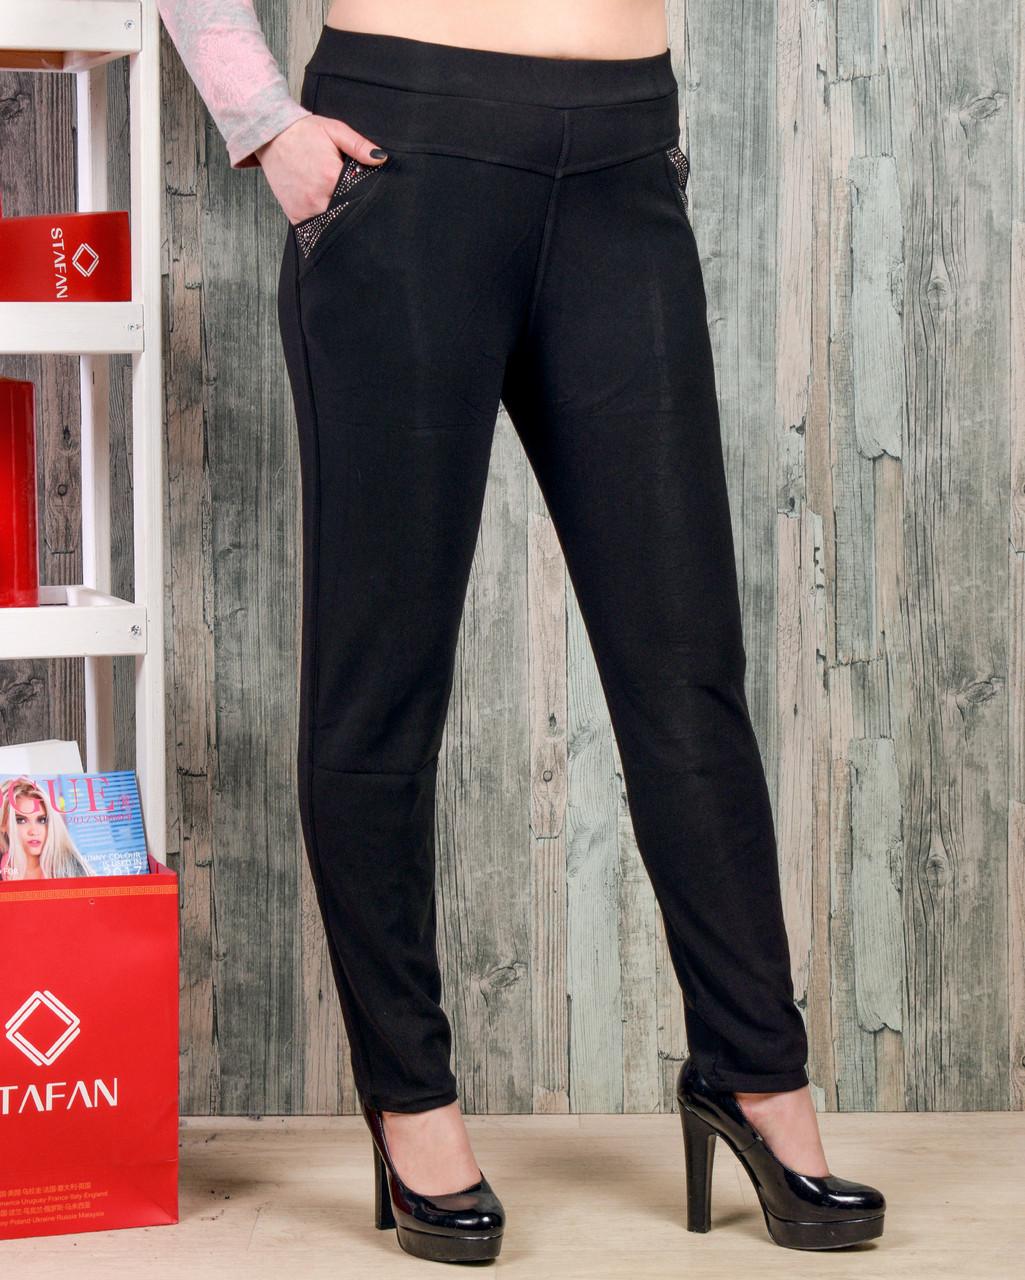 Женские брюки со стразиками на карманах Jujube B035-2 L-XL. Размер 46-